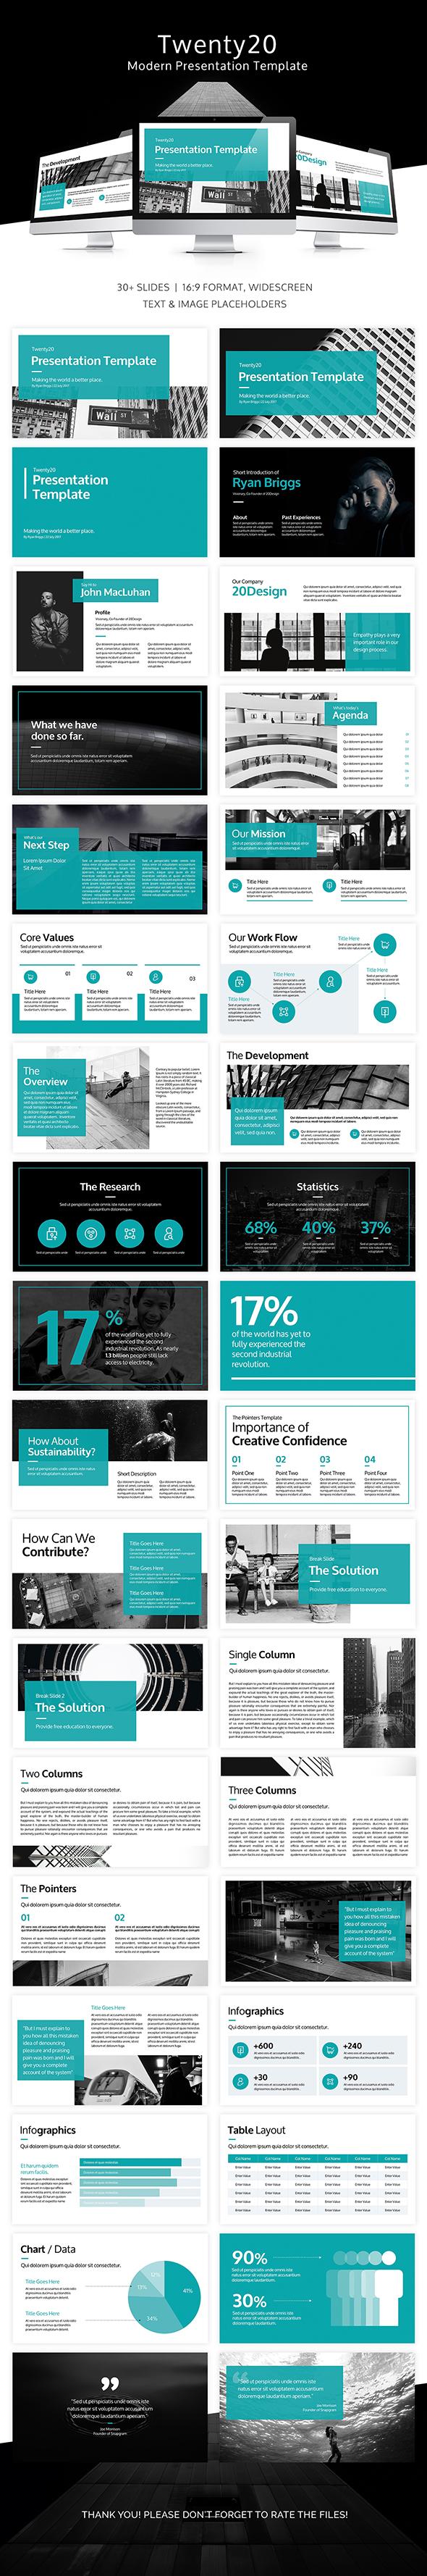 Twenty20 Google Presentation Slide Template - Google Slides Presentation Templates